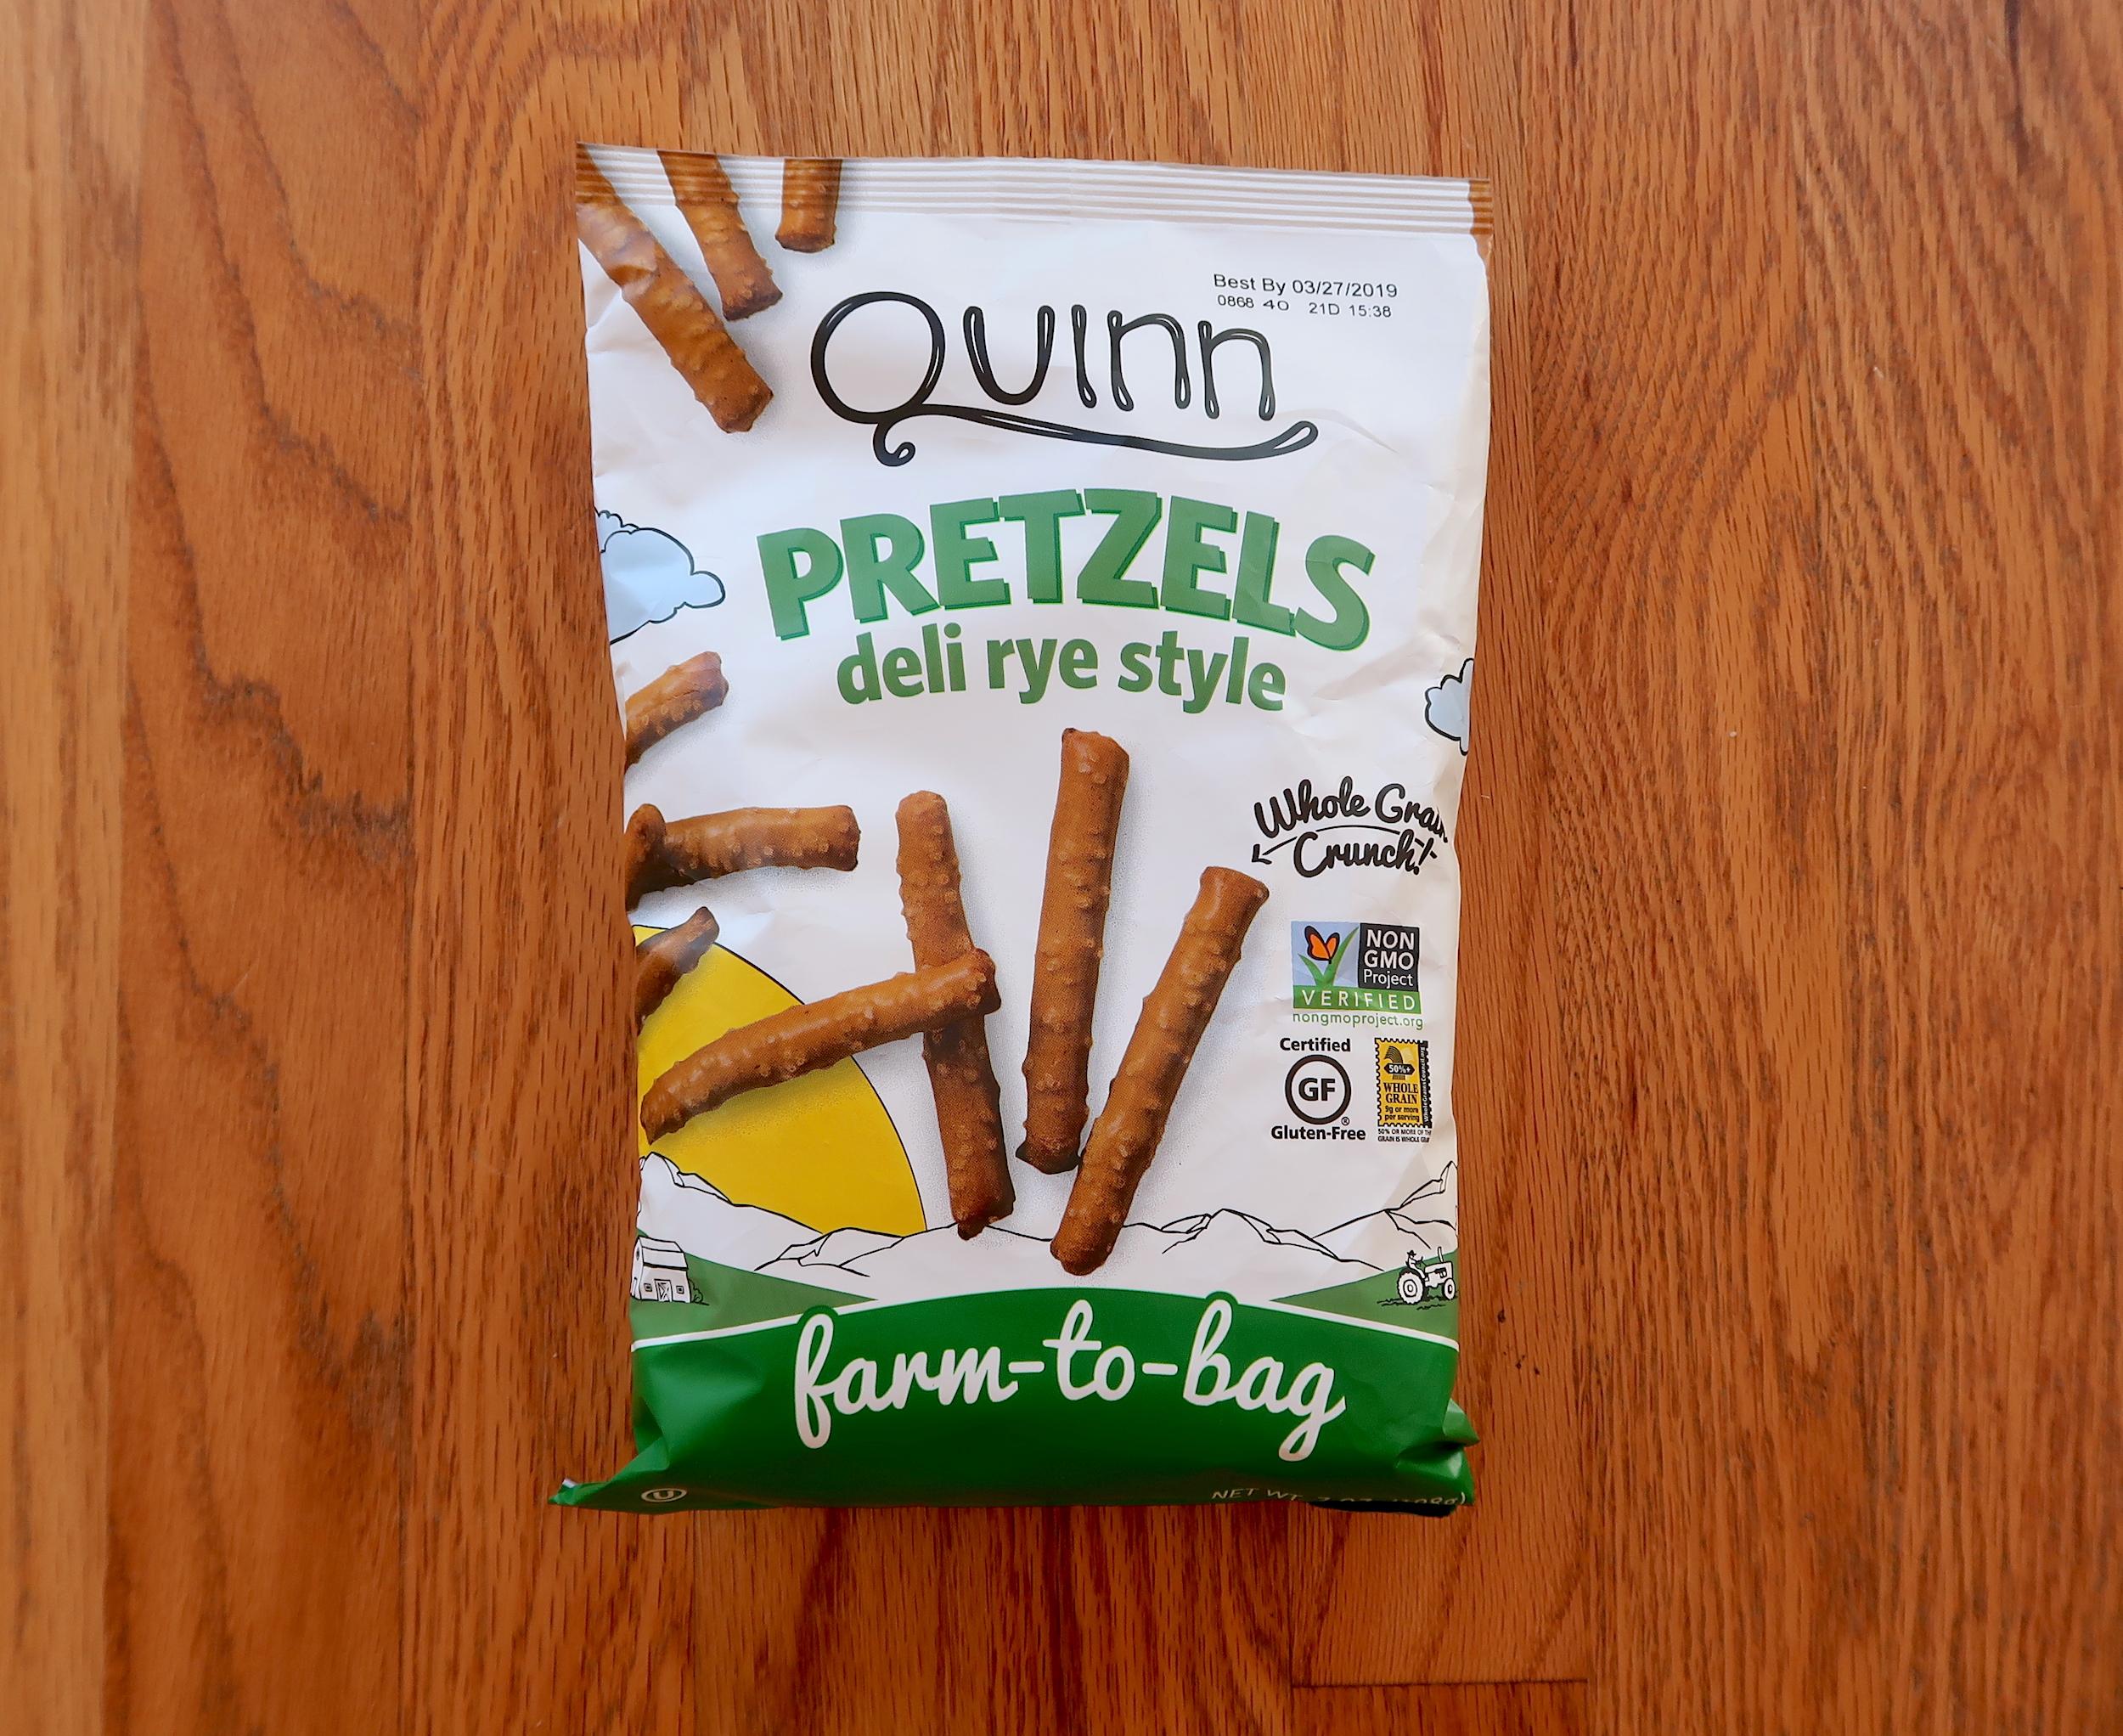 snackface quinn pretzels.JPG